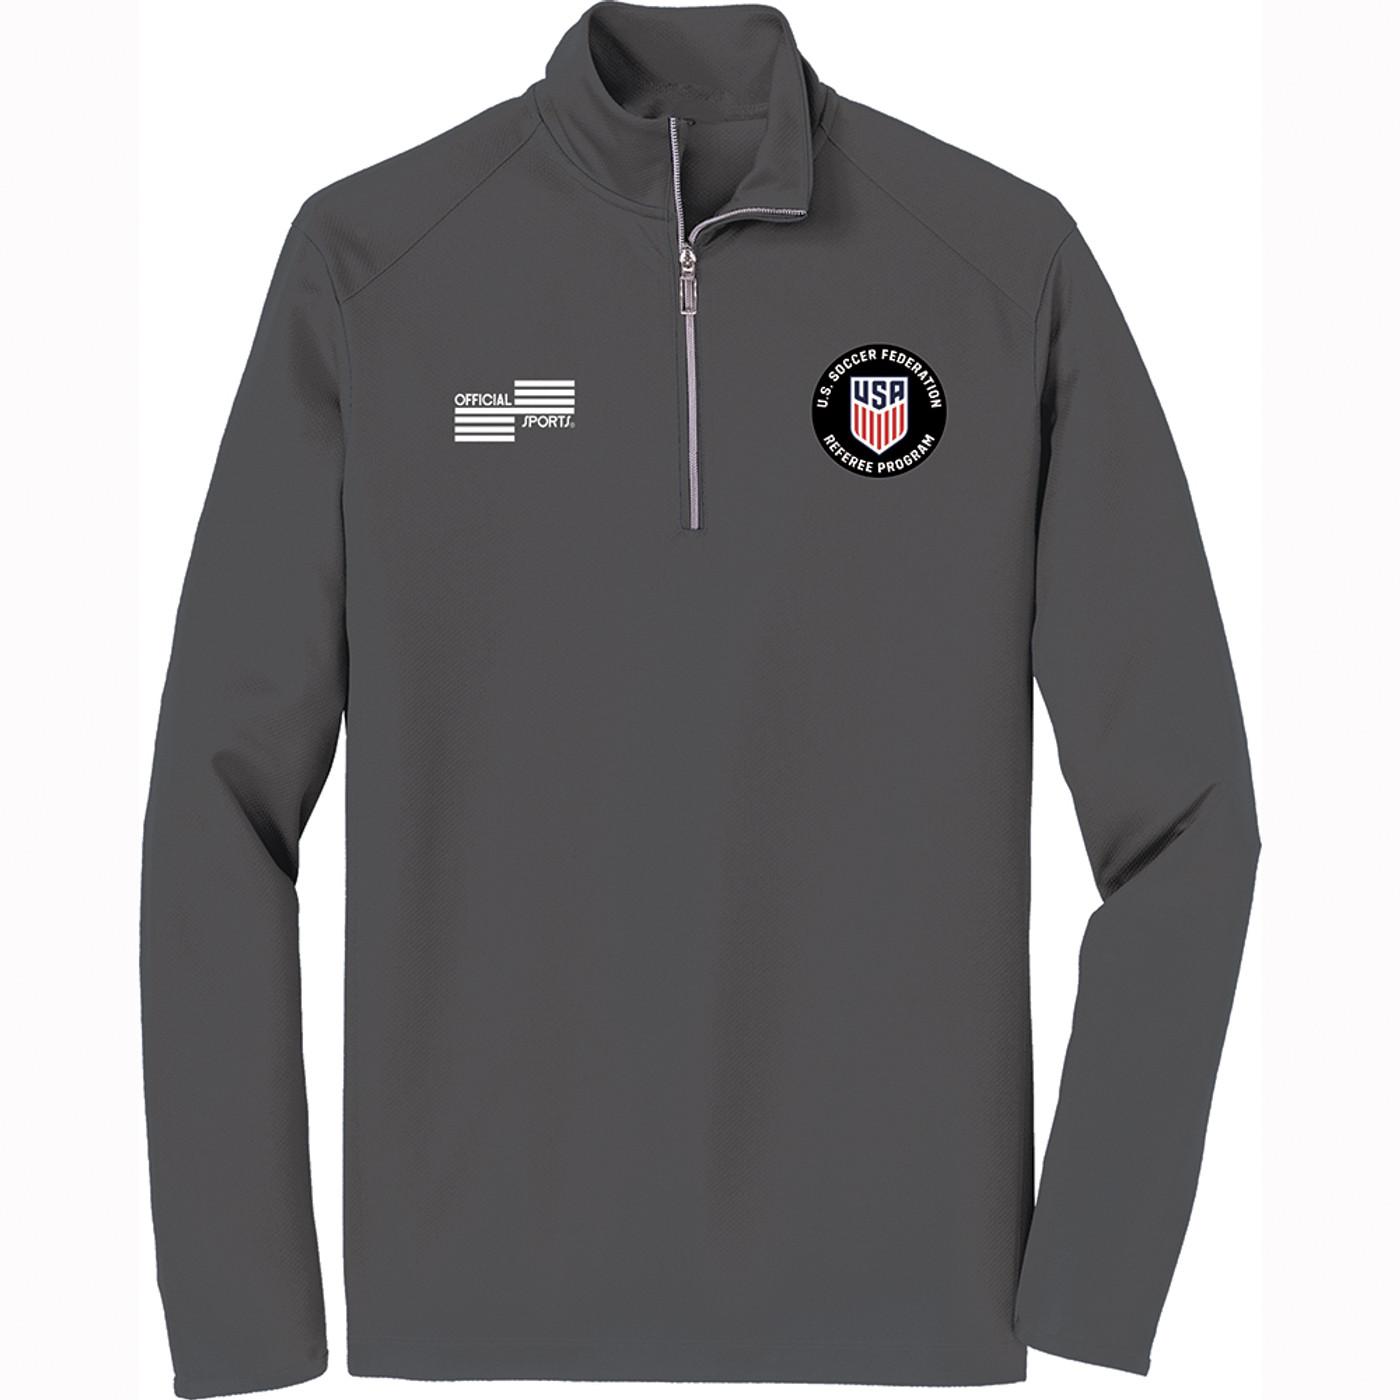 2223CL USSF Quarter Zip Long Sleeve